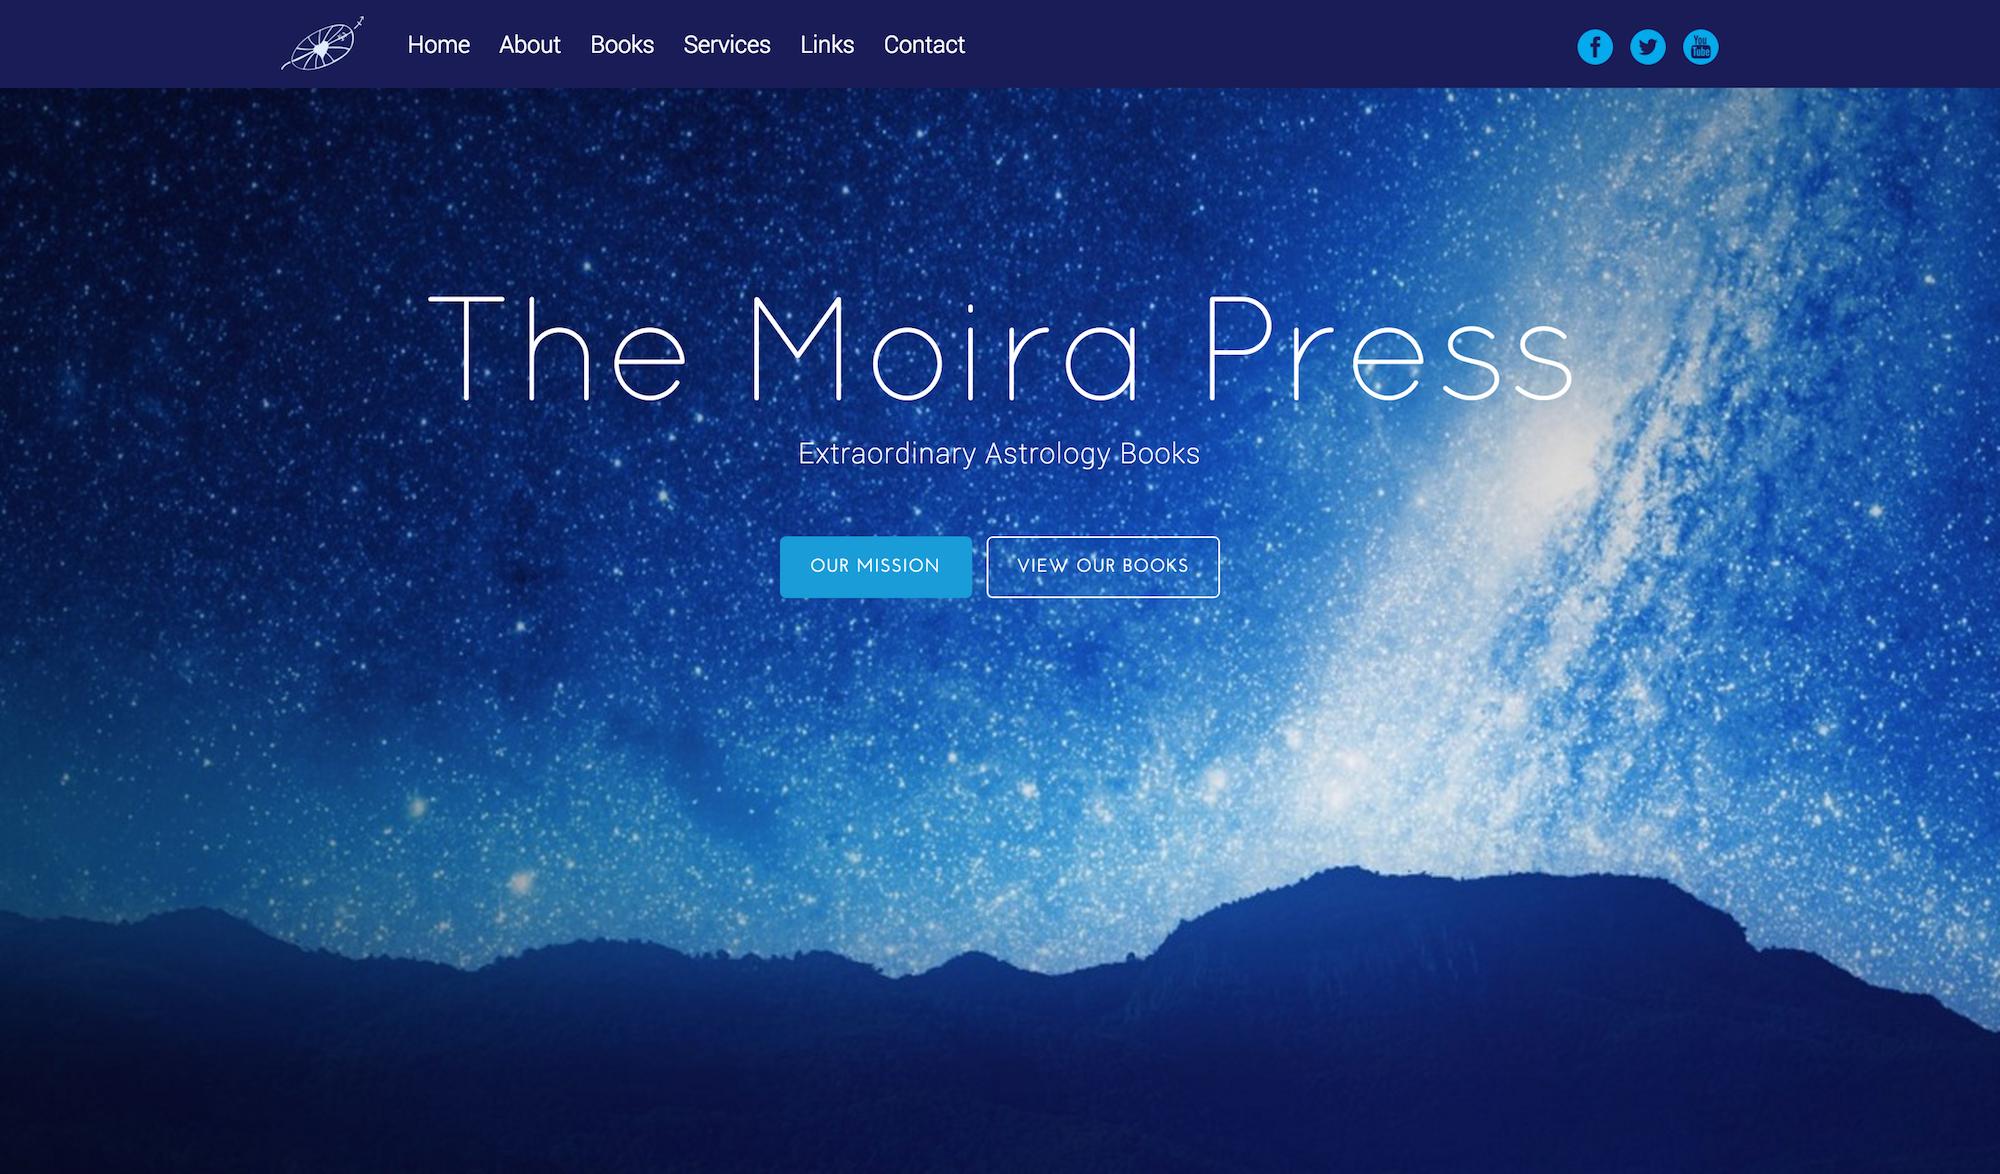 Home – The Moira Press